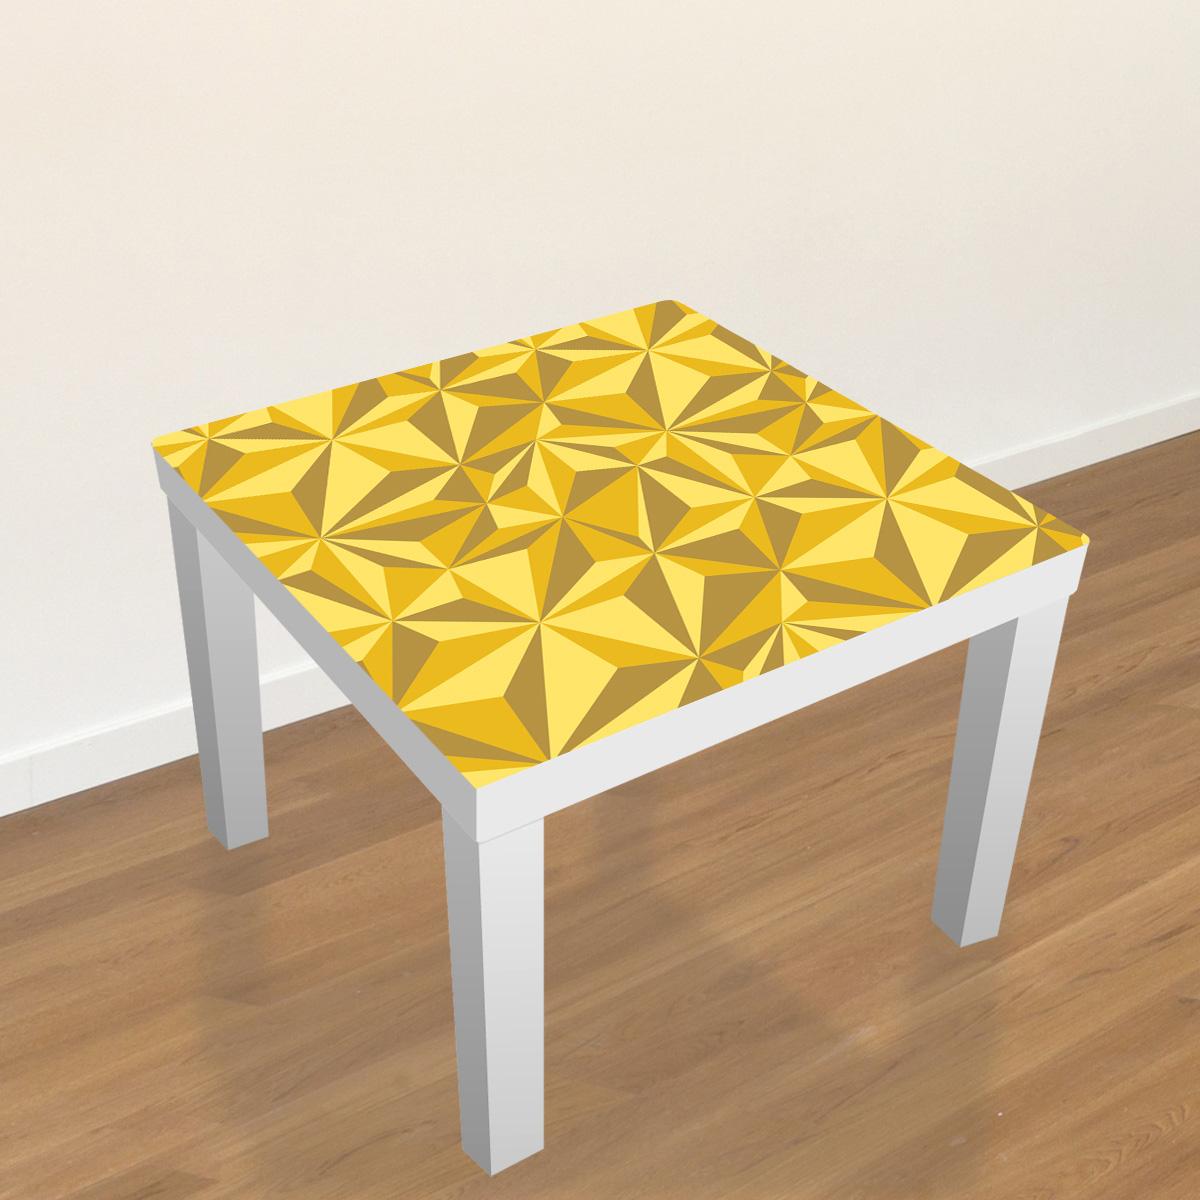 stickers meubles ikea stickers meubles ikea des cristaux d 39 or ambiance. Black Bedroom Furniture Sets. Home Design Ideas